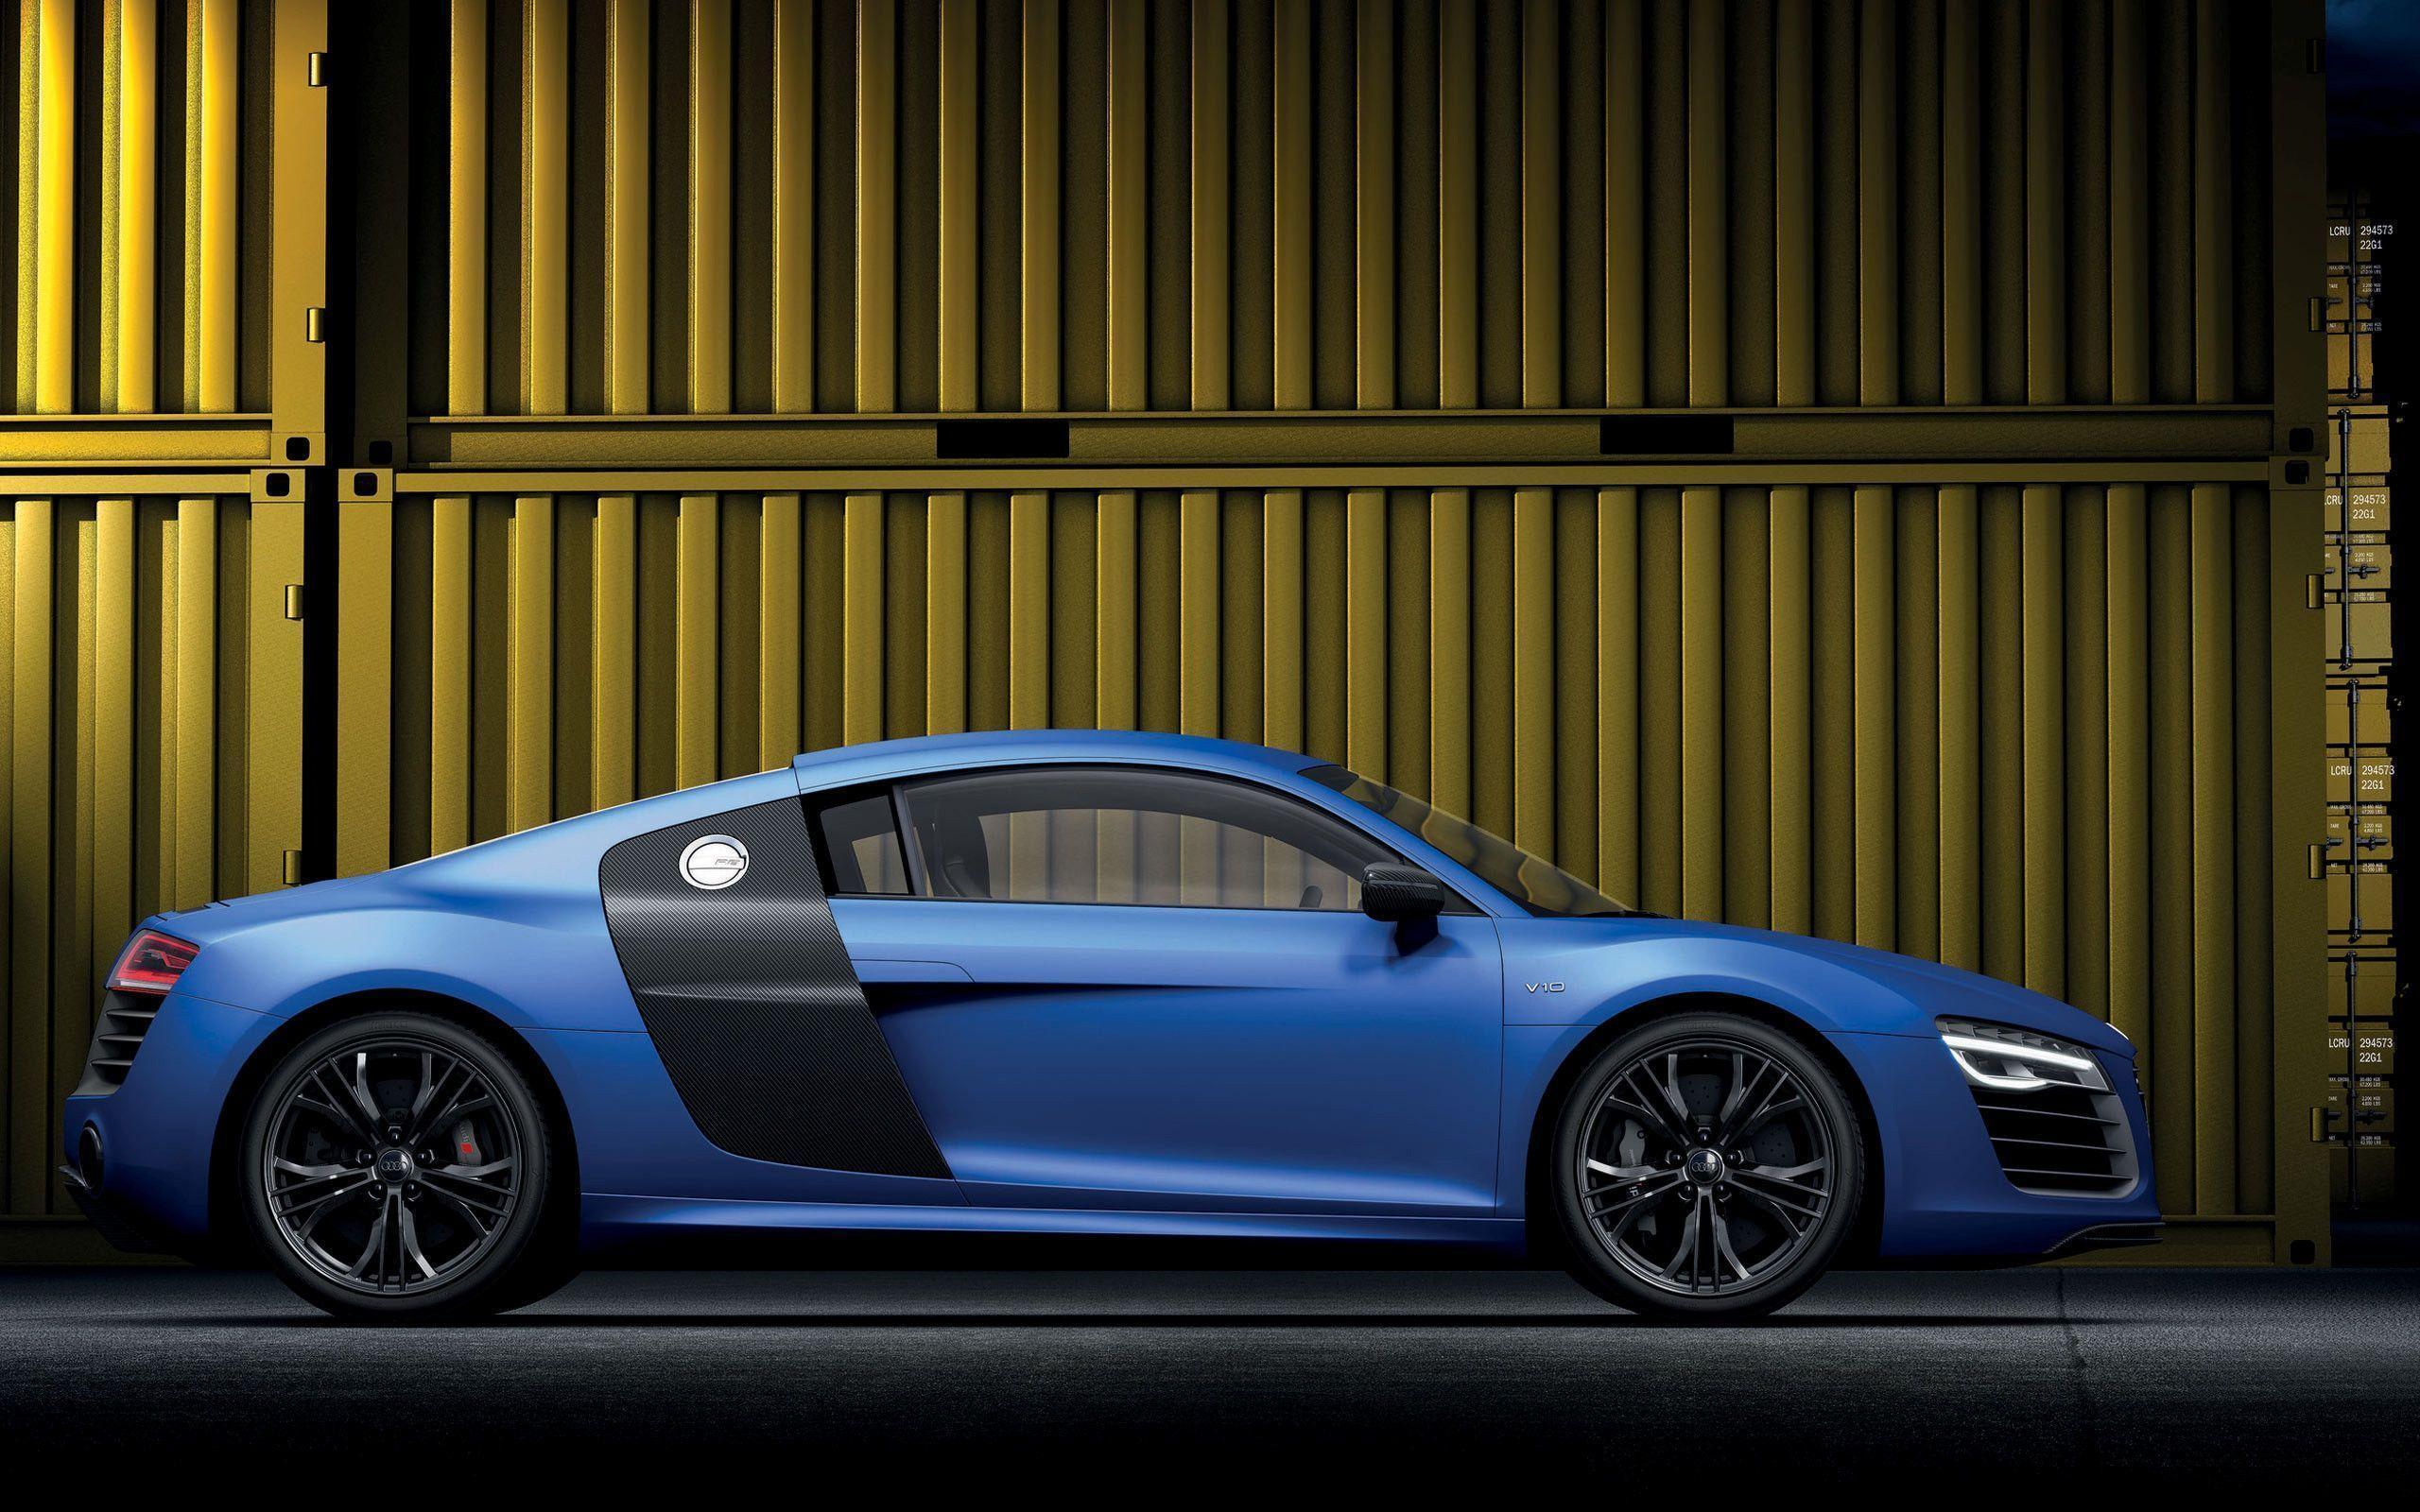 Audi R8 V10 Wallpapers - Wallpaper Cave